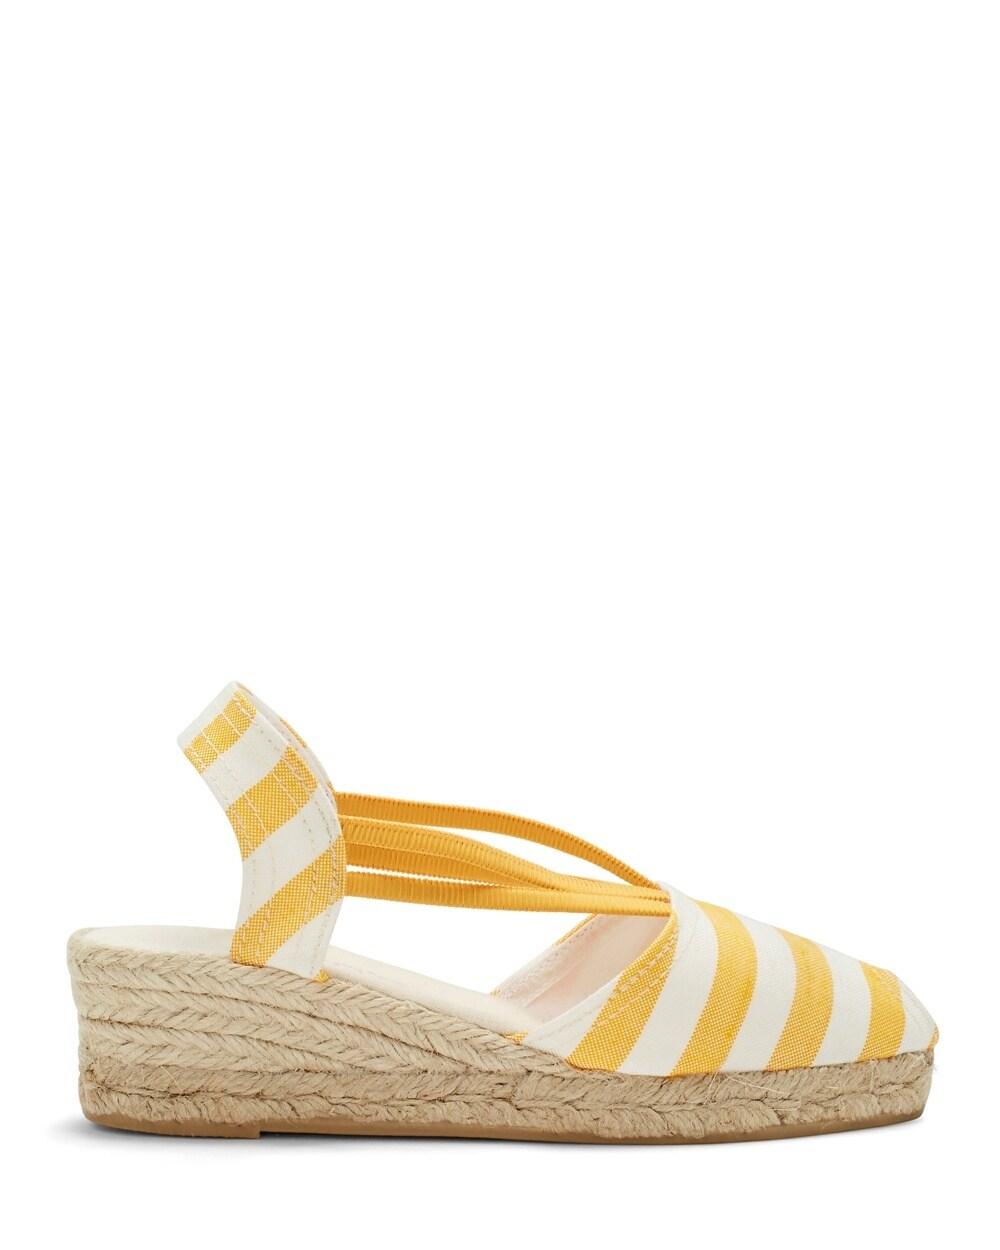 1515acb23f4 Jessa Yellow Striped Espadrille Wedges